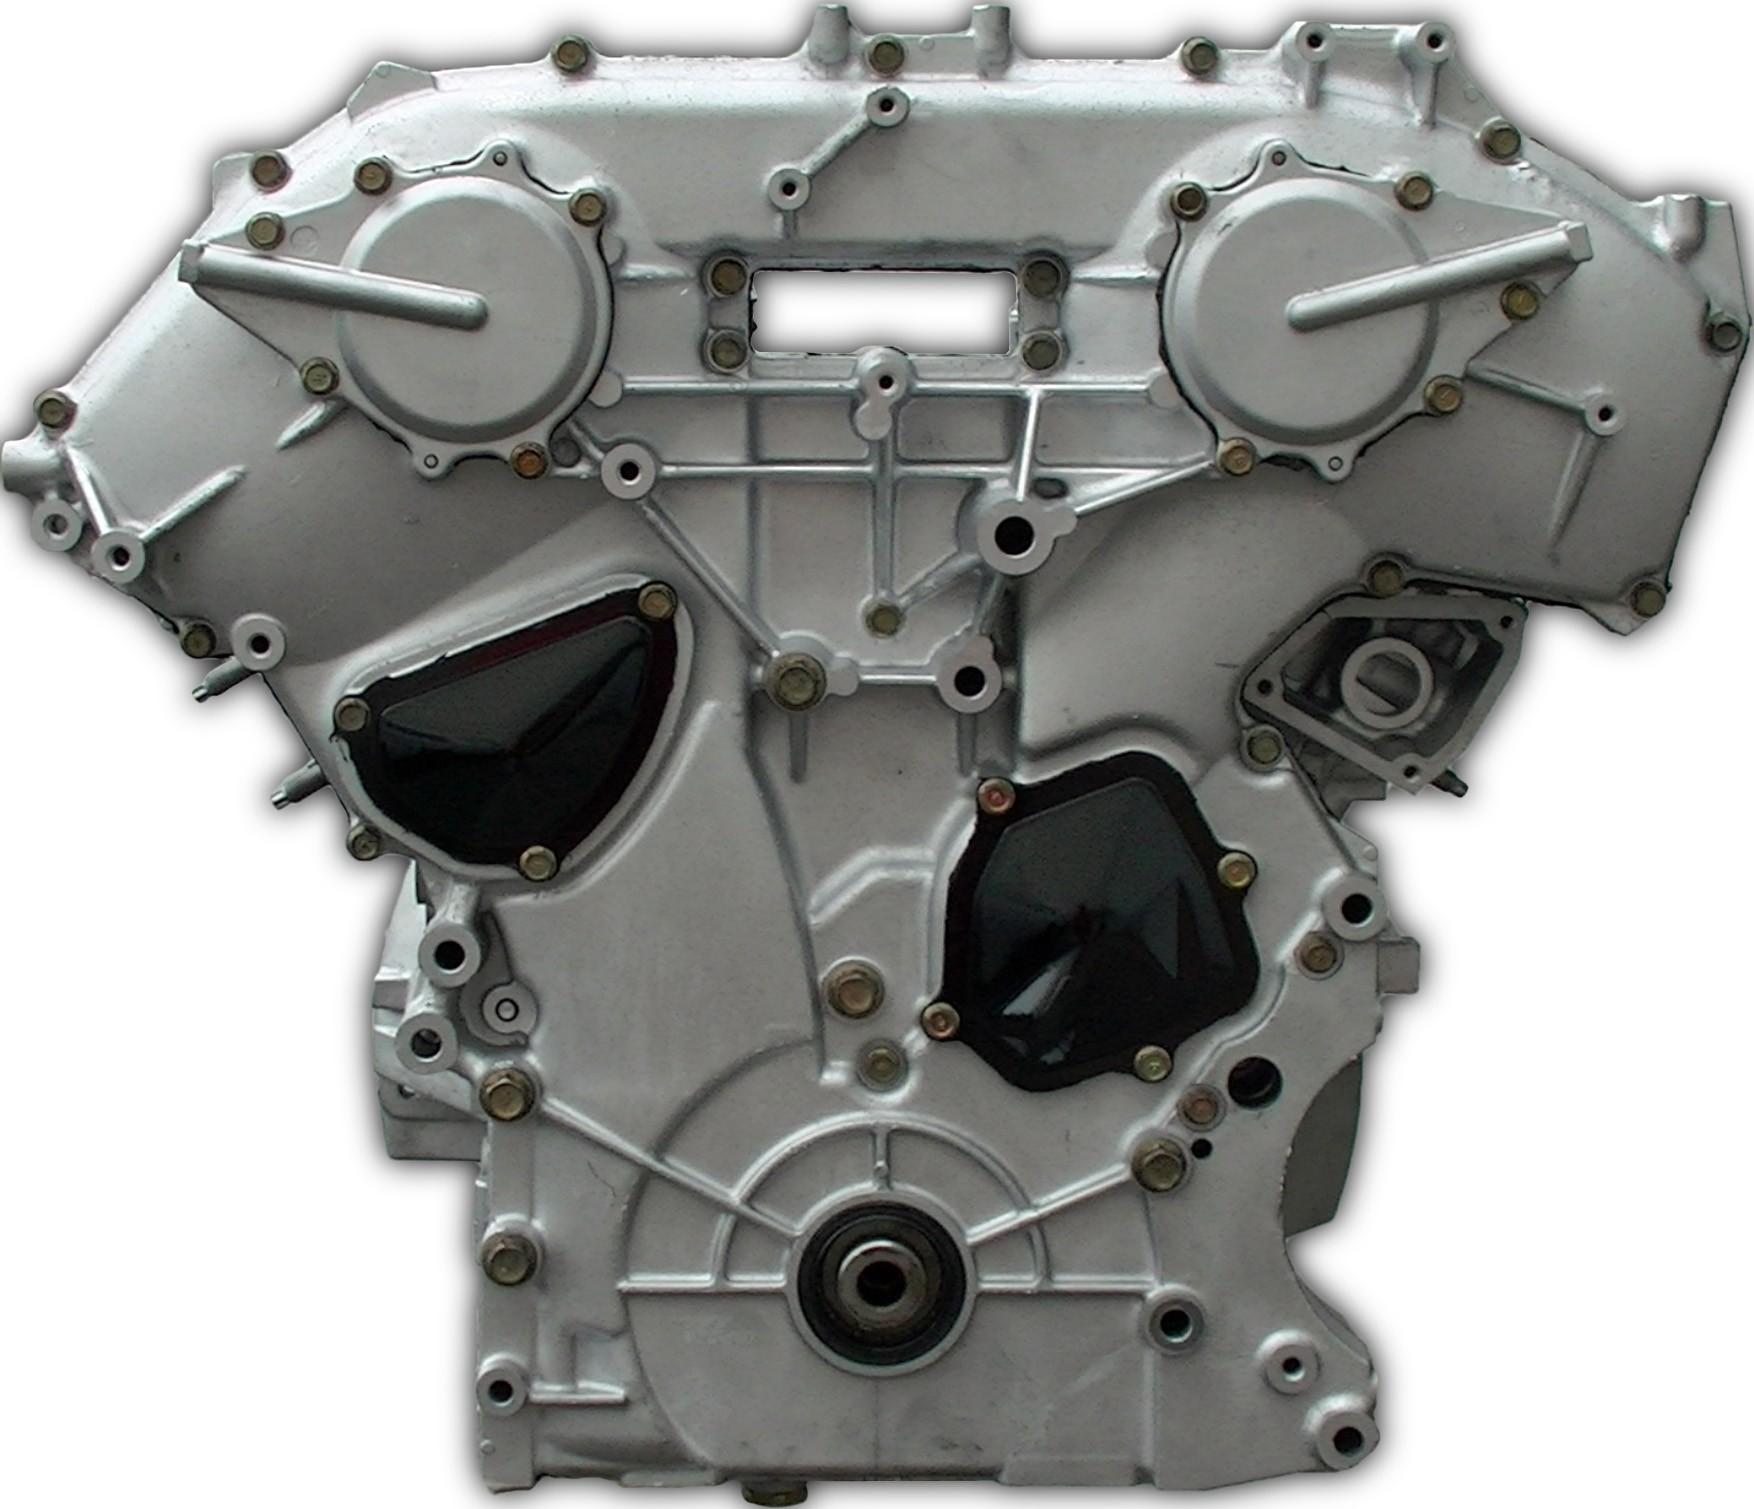 Rebuilt 09 12 Nissan Frontier 4 0l V6 Vq40de Engine Kar King Auto